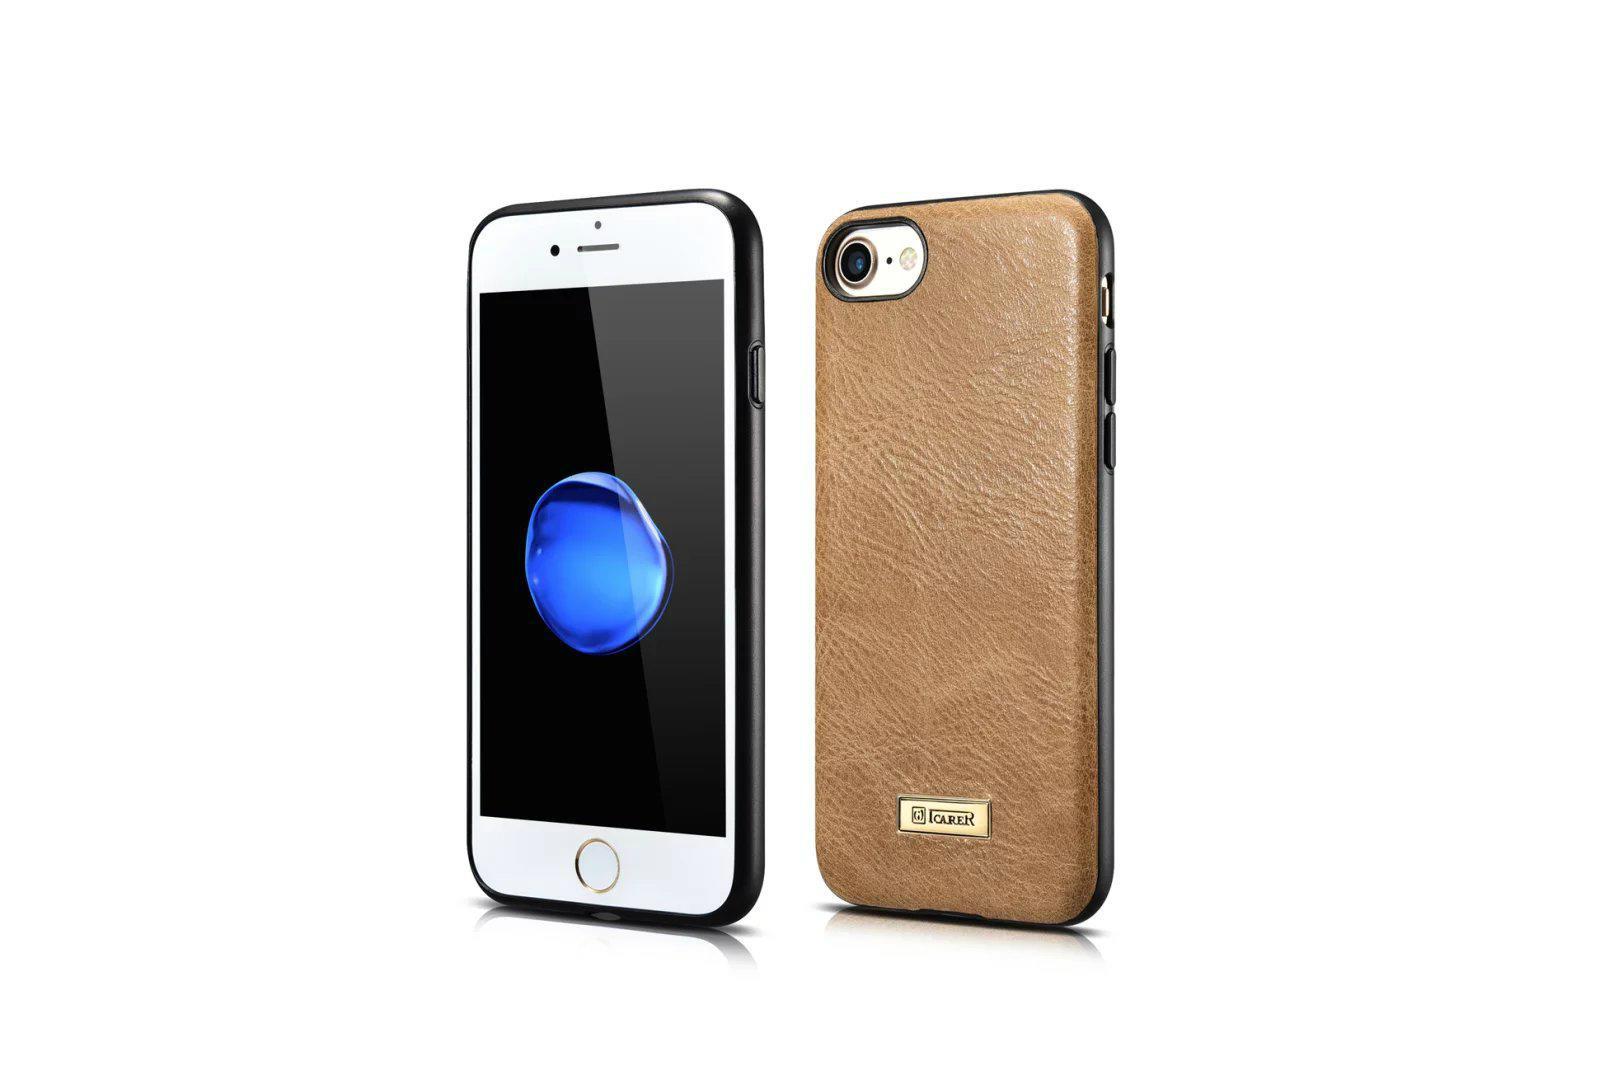 iCarer iPhone 7 Shenzhou Genuine Leather Fashional Back Cover Case 5